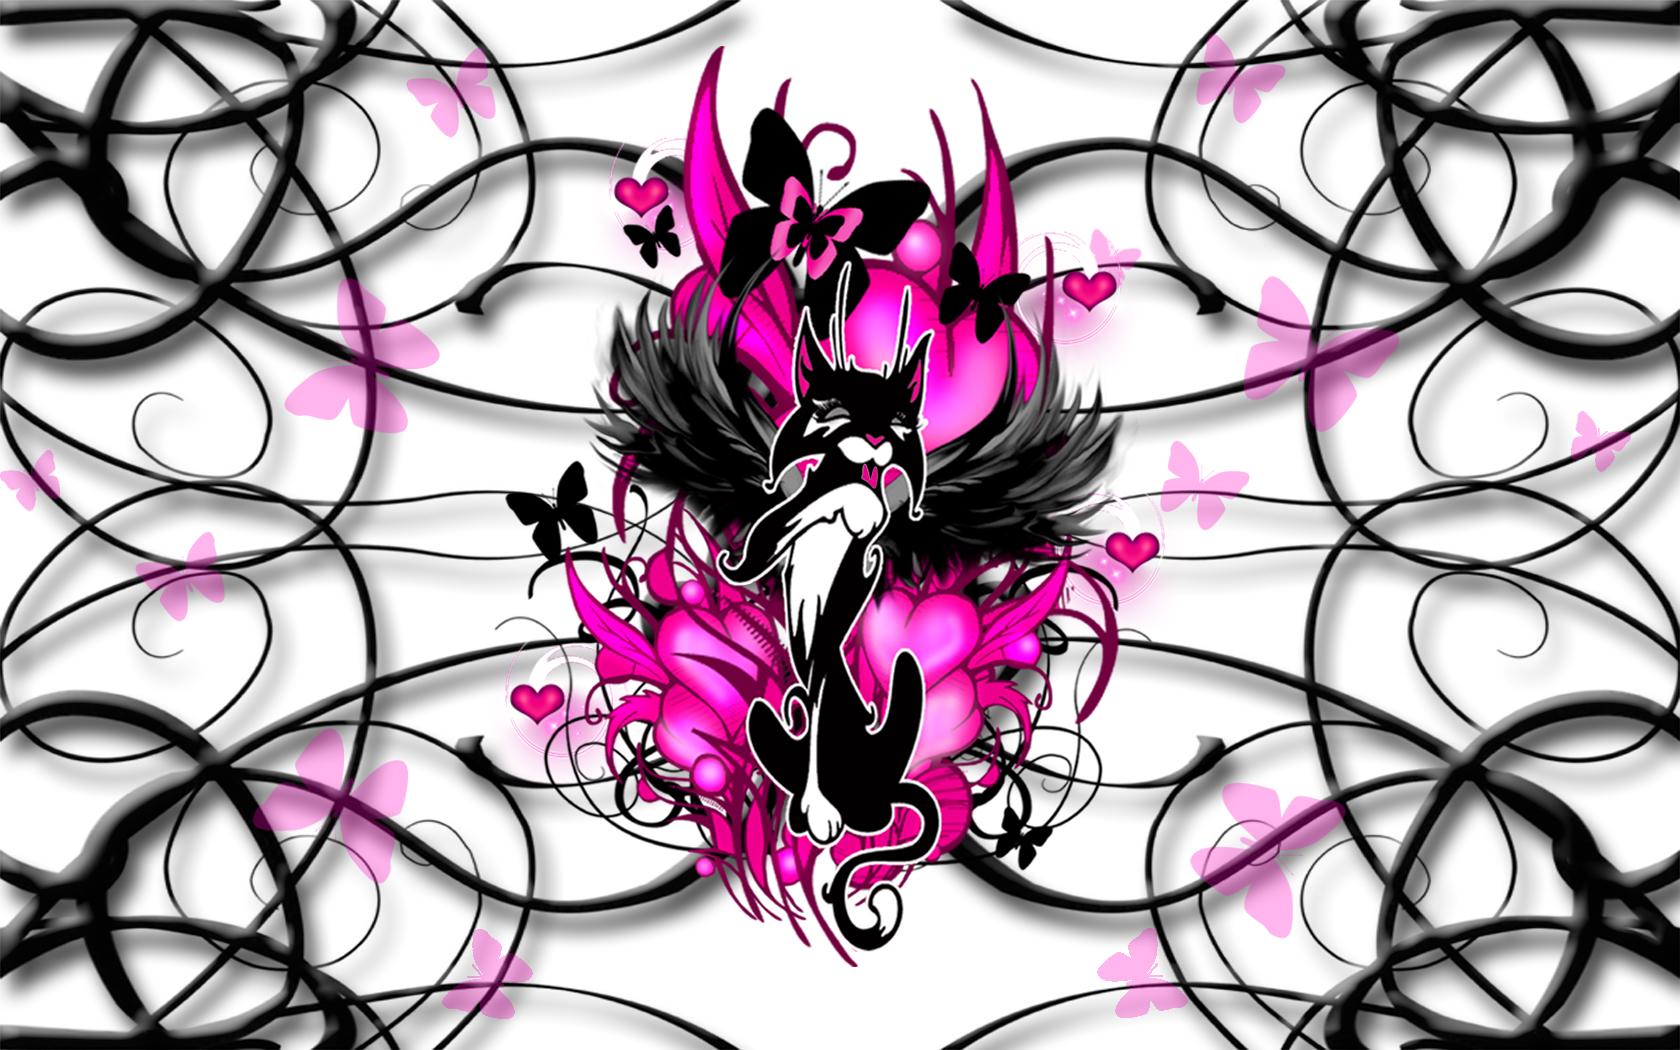 Pink And Black Wallpaper Designs 18 Widescreen Wallpaper ... |Black And Pink Wallpaper Design